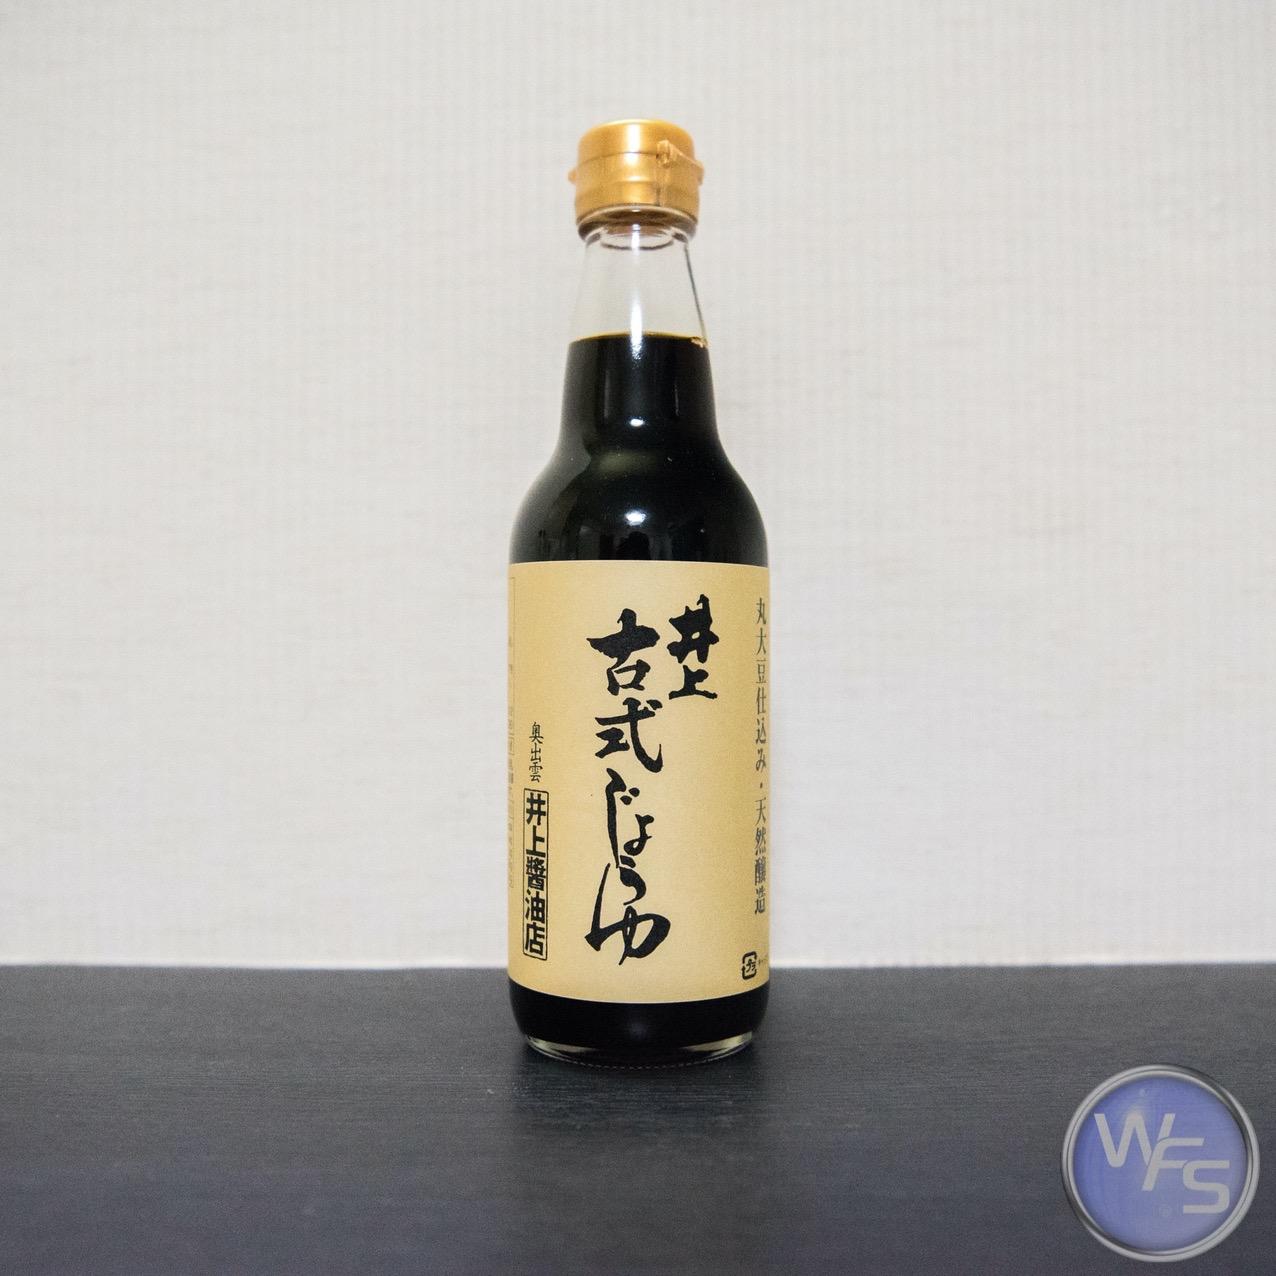 The soy sauce cruet04